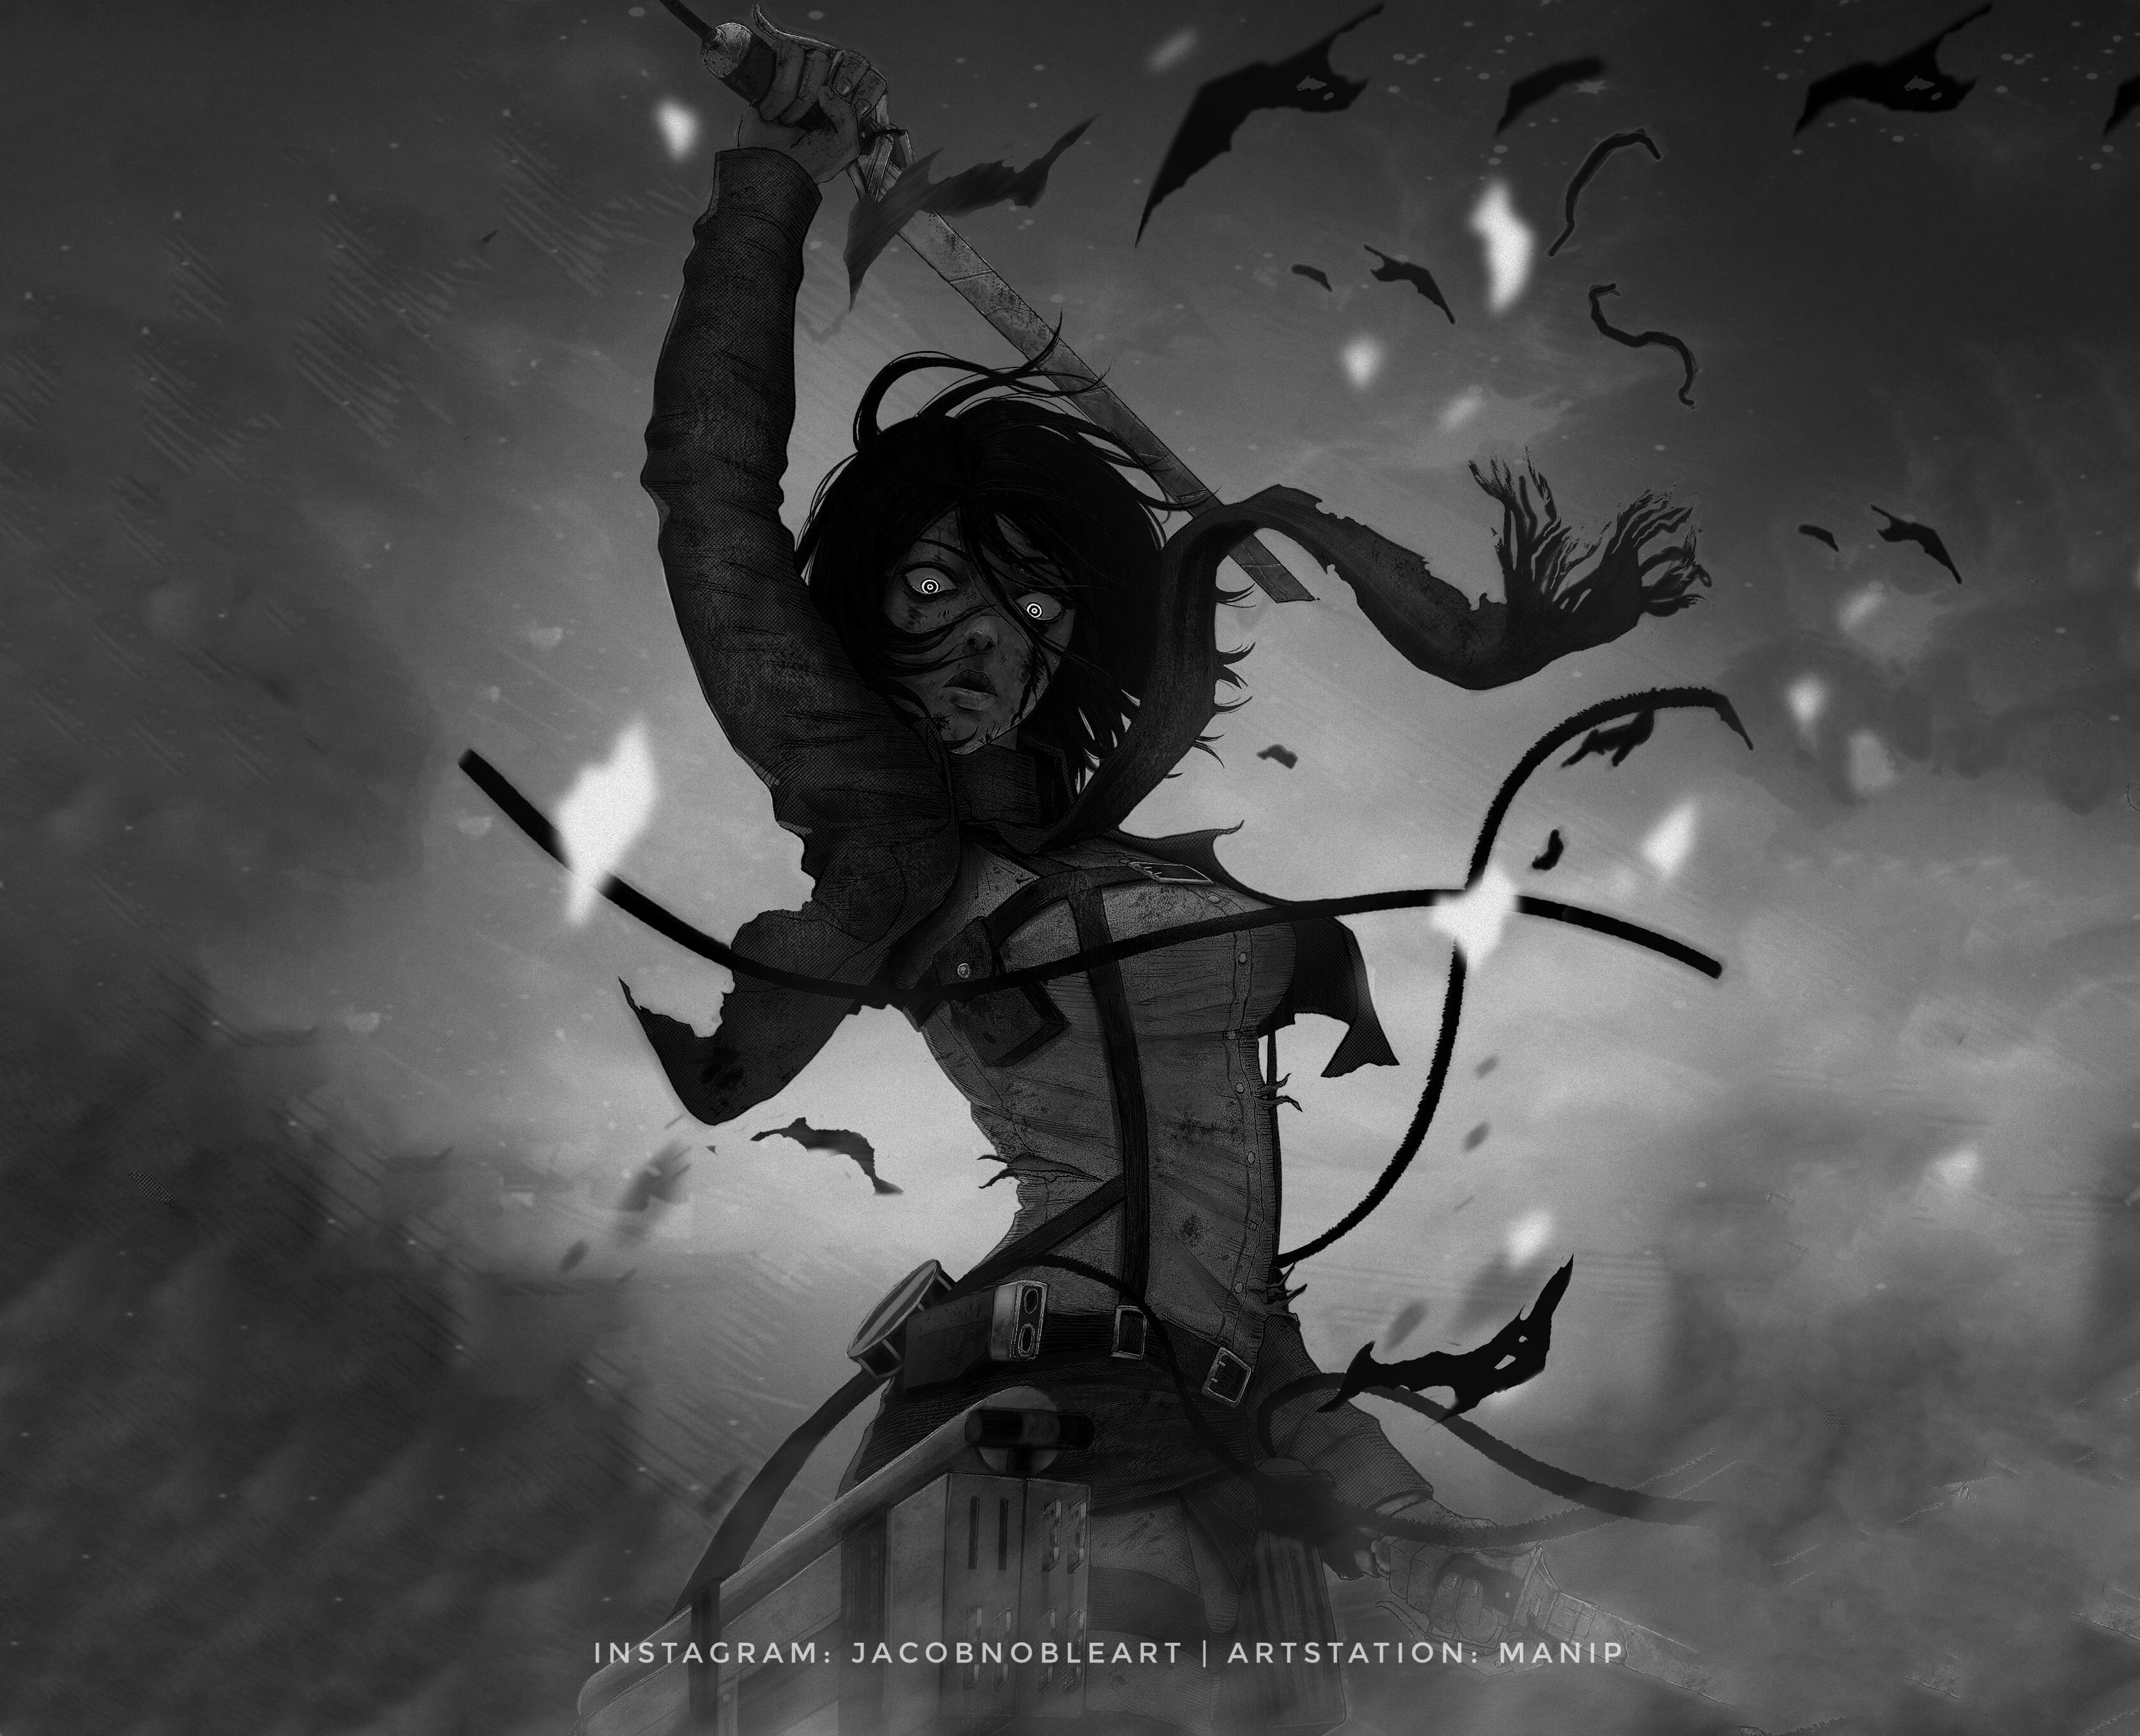 Mikasa Ackerman Hd Wallpaper Background Image 3348x2716 Id 1024257 Wallpaper Abyss